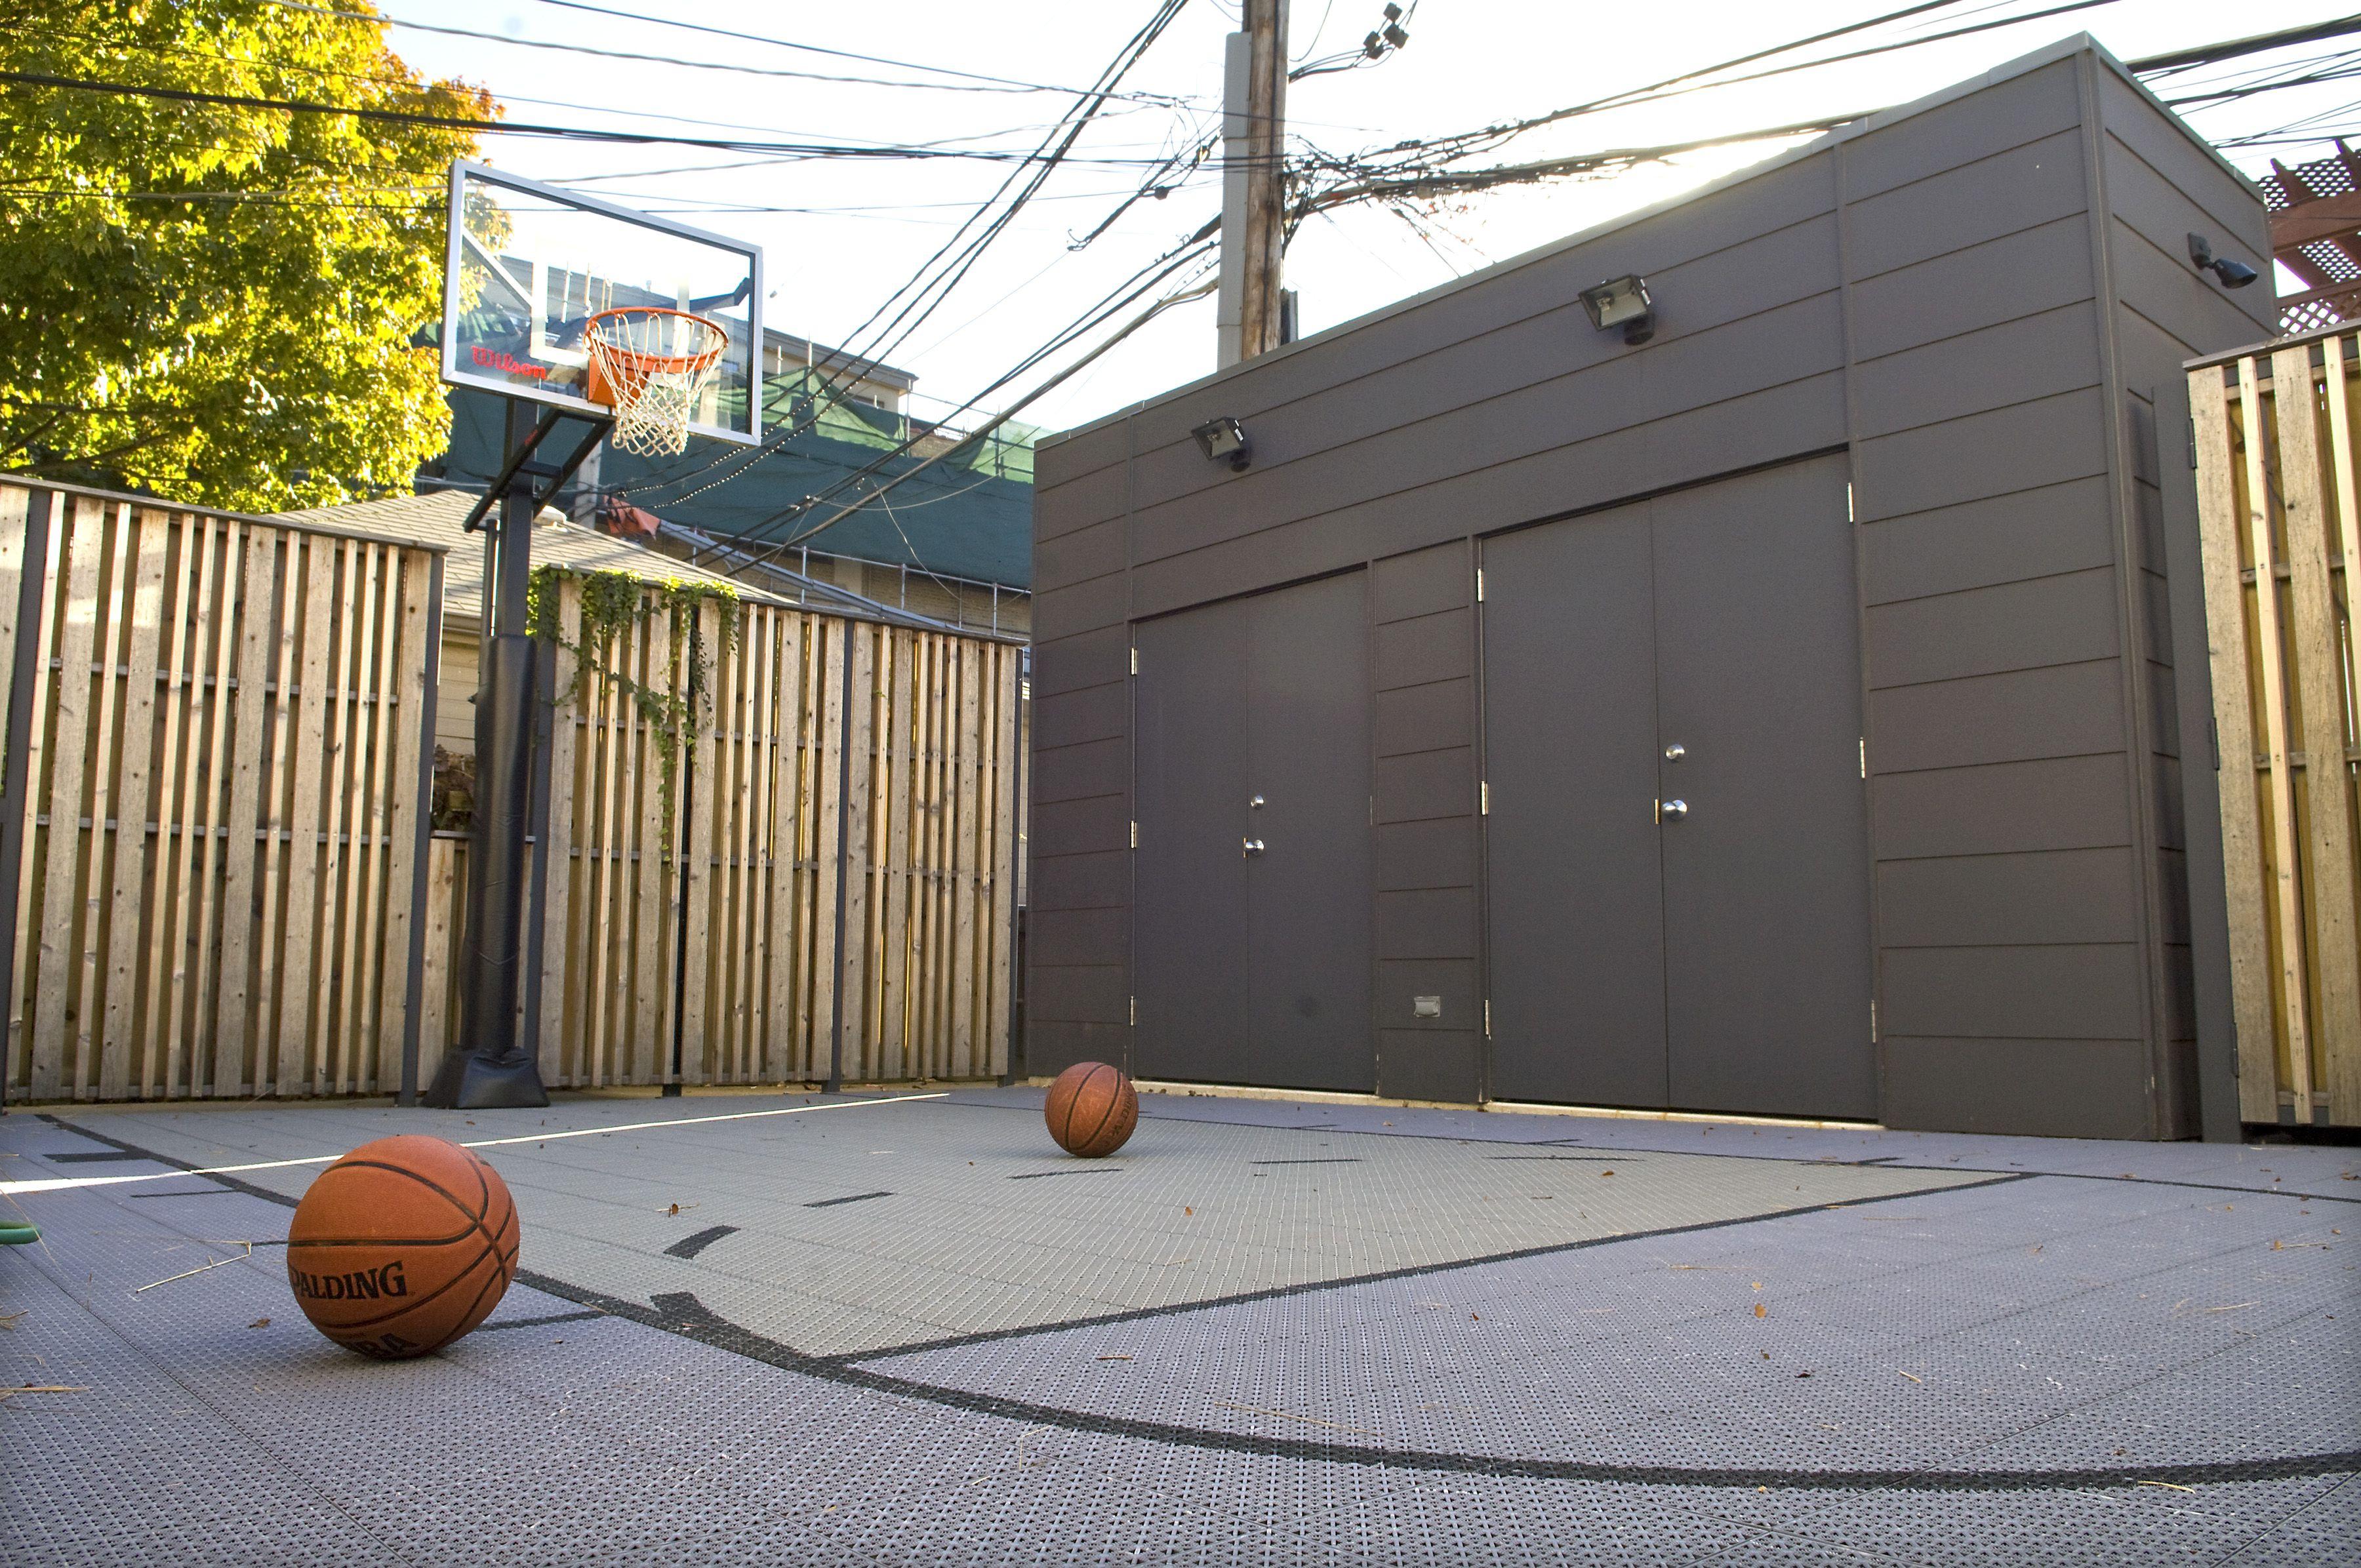 backyard sport court u0026 shed bob brobson inc chicago roof play